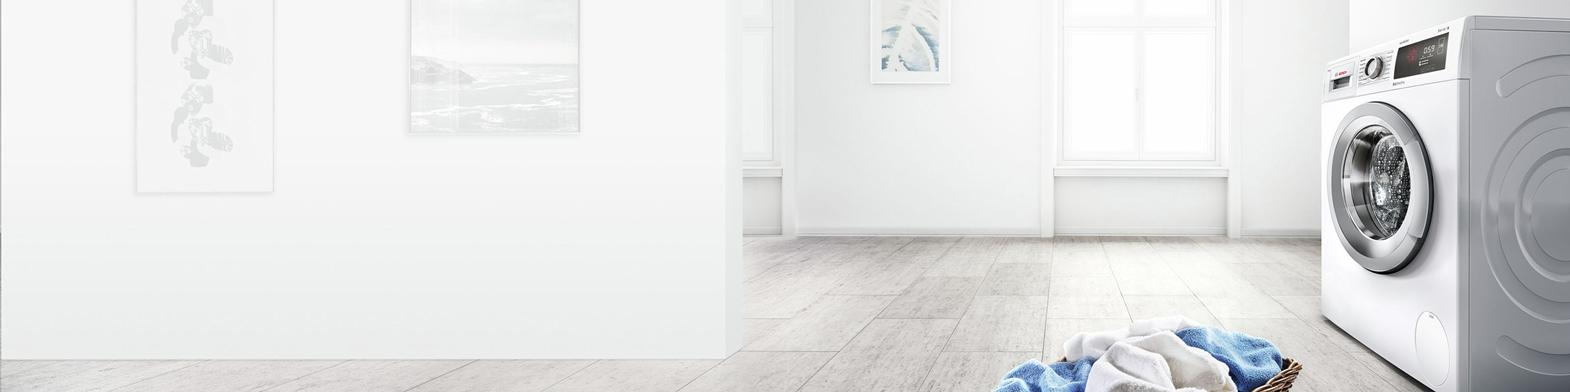 Bosch_Wasmachine-sfeerbeeld-4000x1000